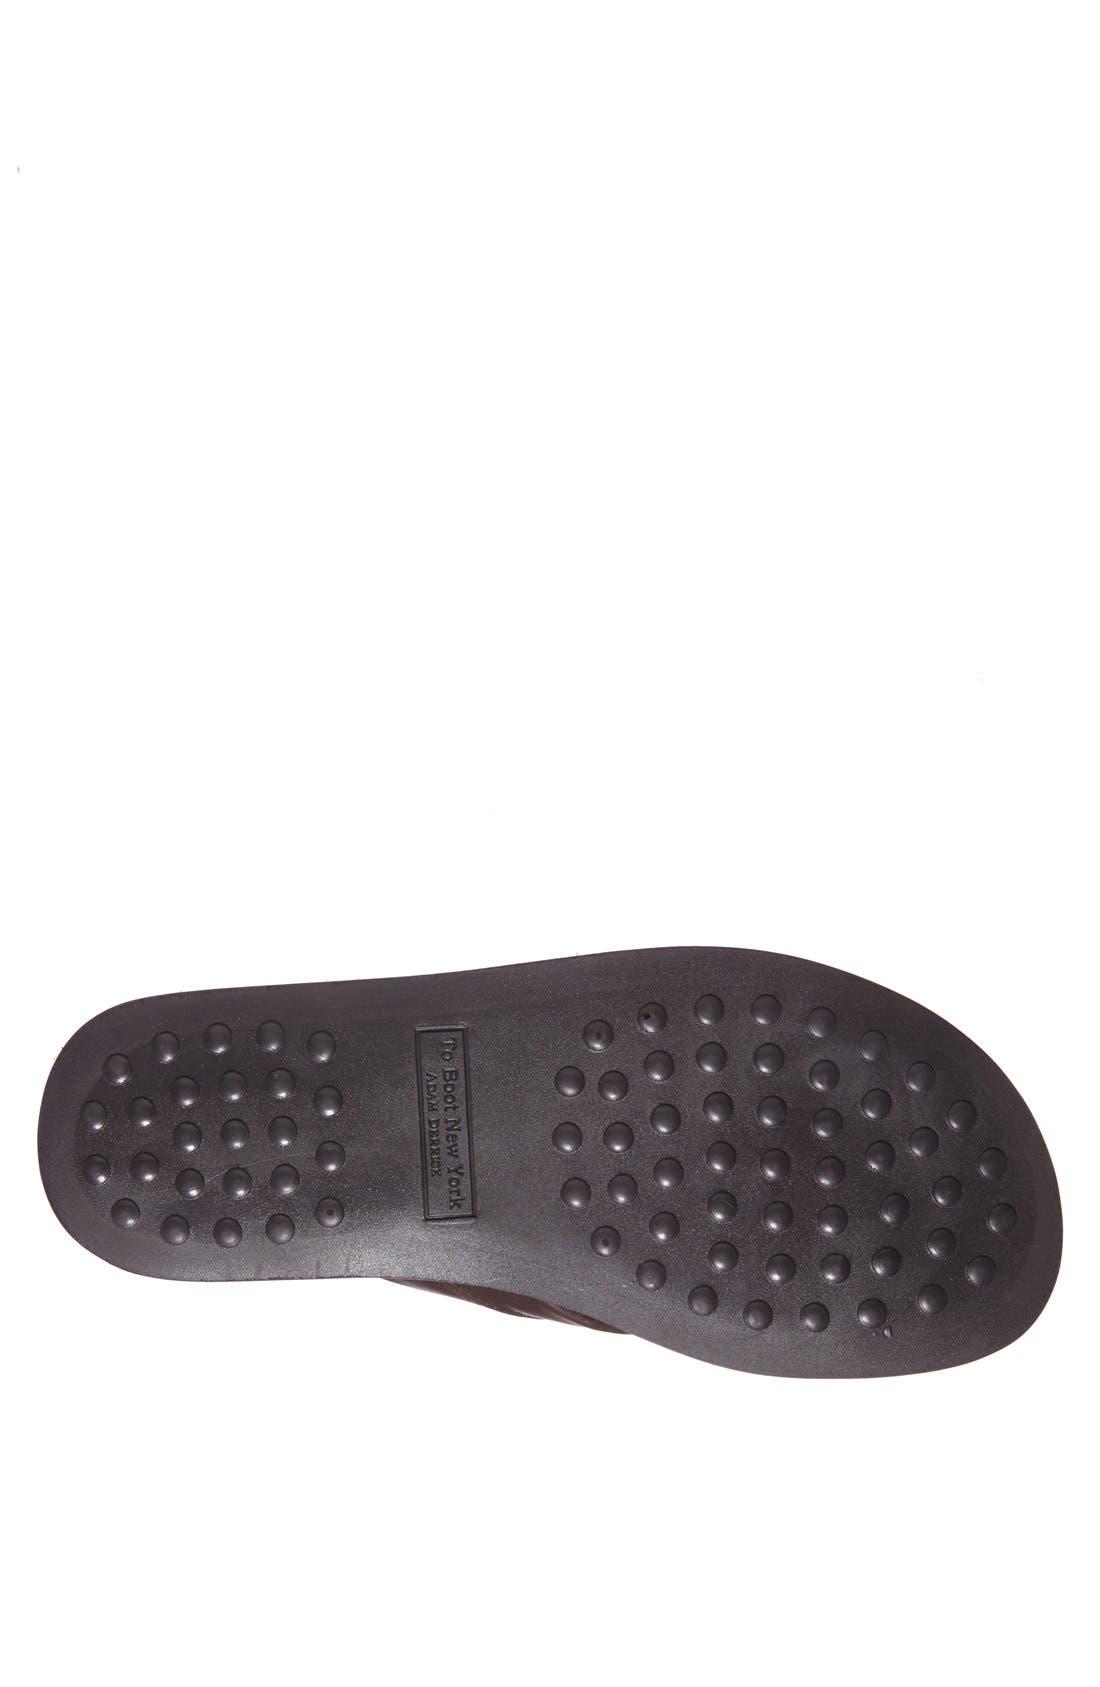 Alternate Image 4  - To Boot New York 'La Hoya' Leather Flip Flop